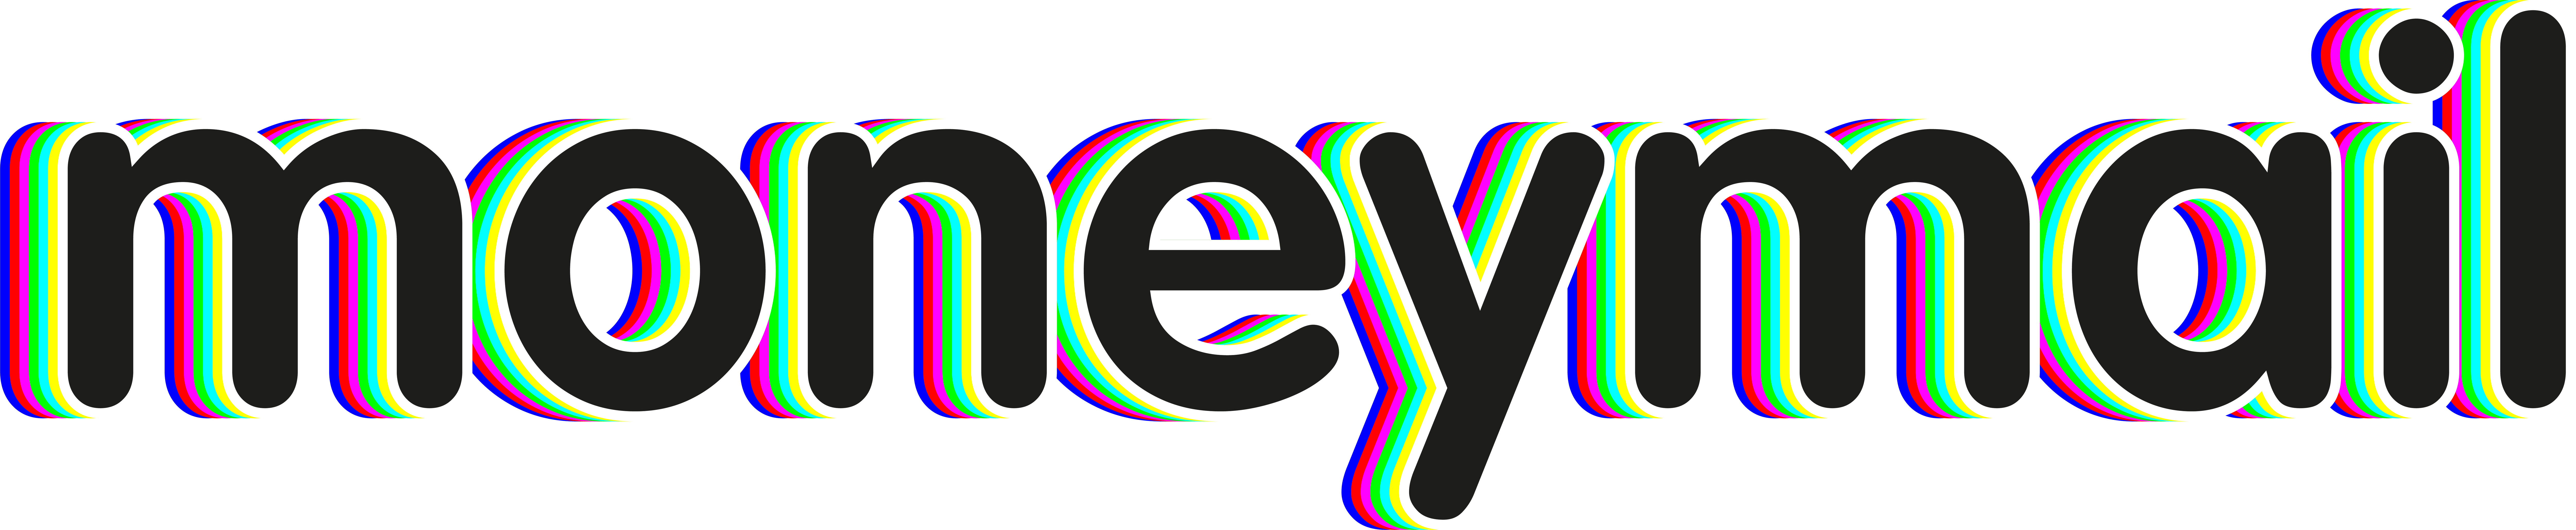 moneymail logo